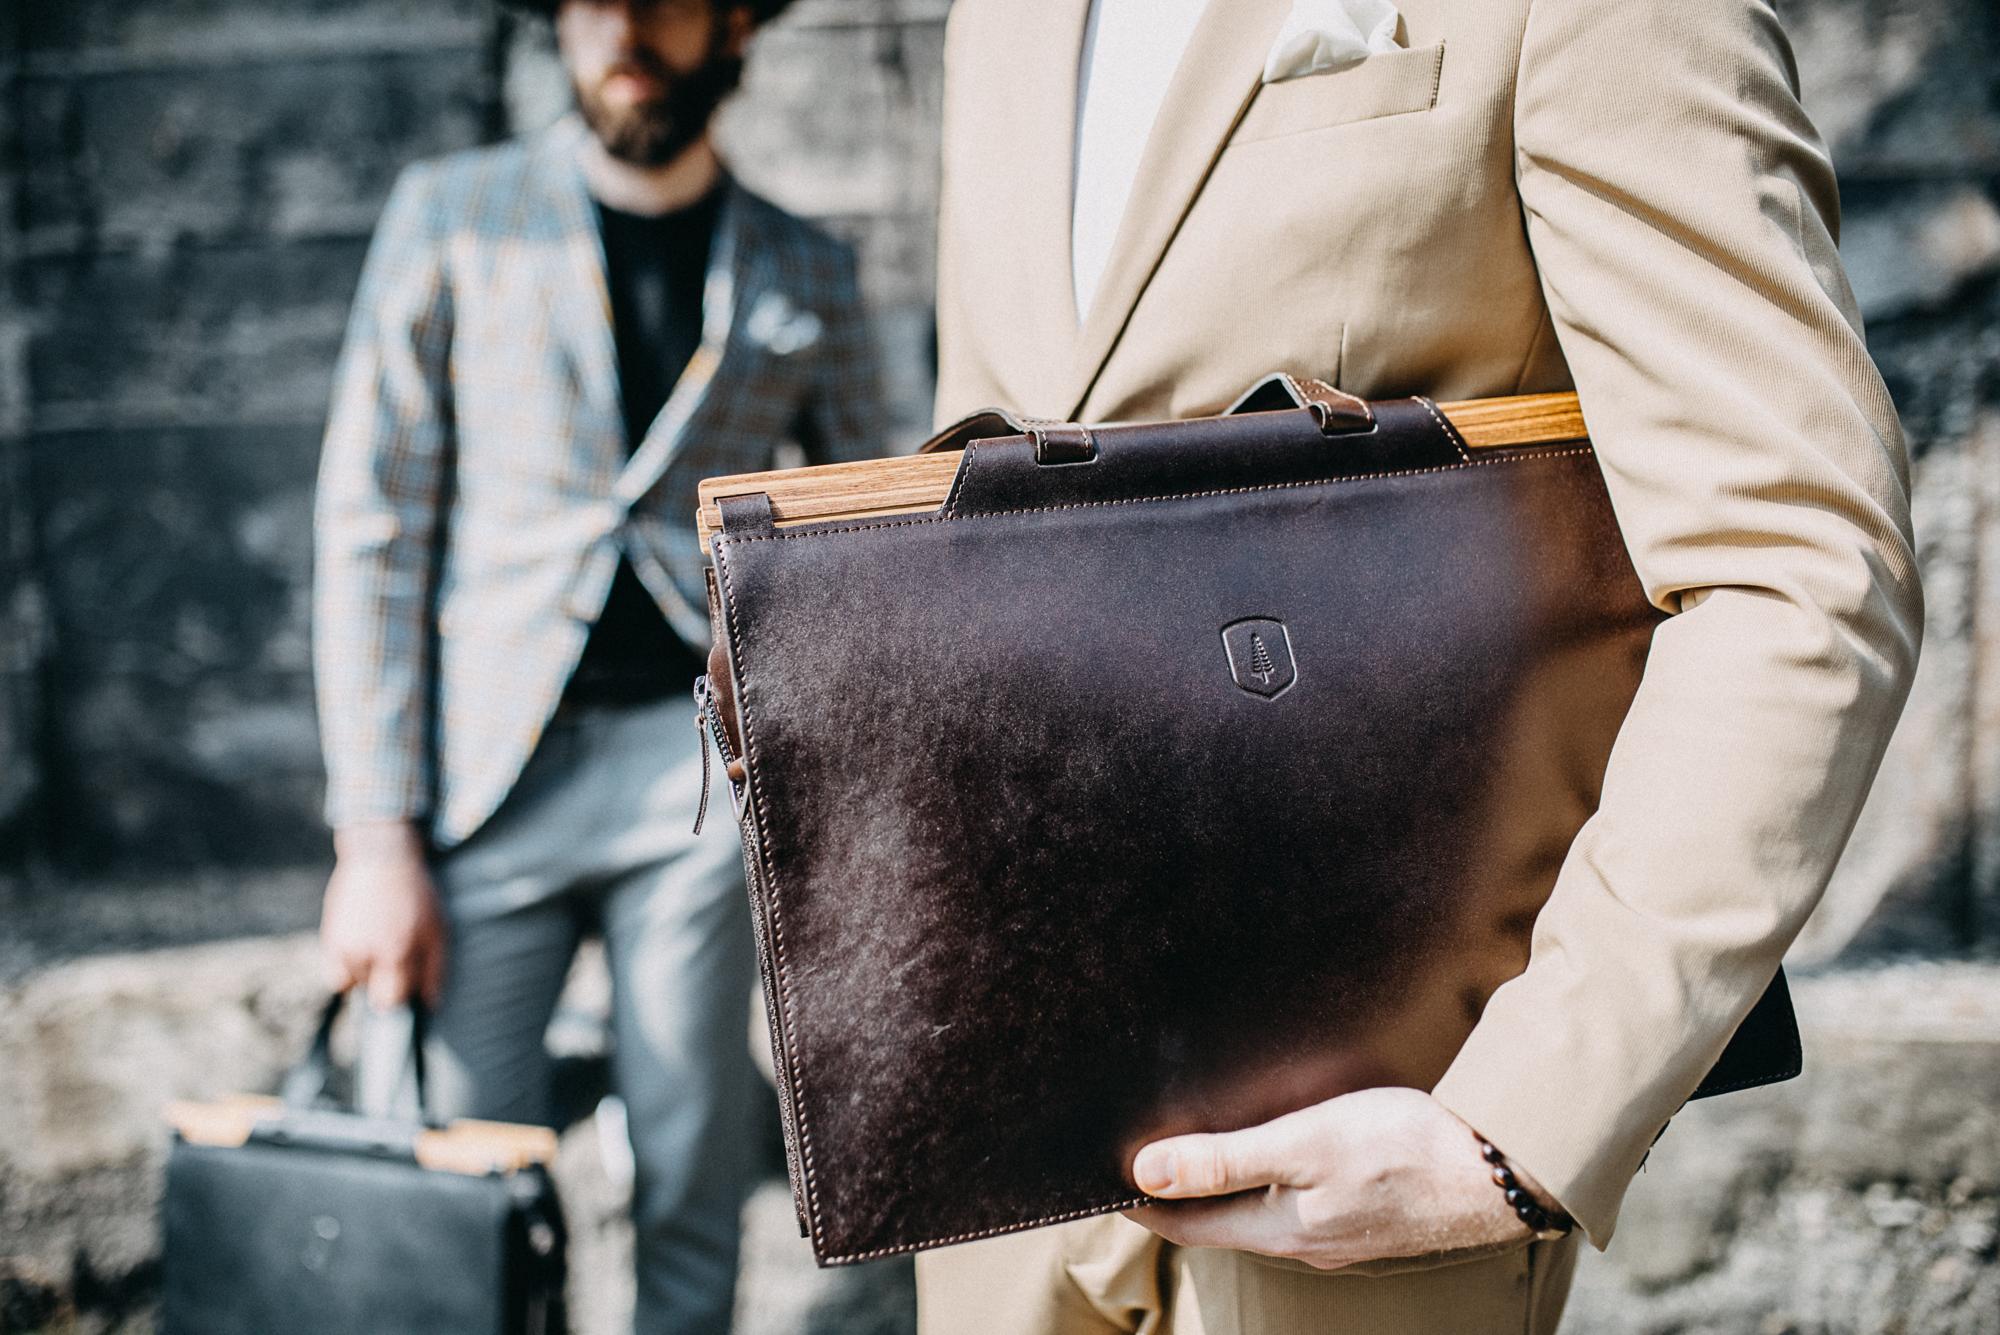 Product_model_fashion_man_business_bag_lineari_handbag_220.jpg